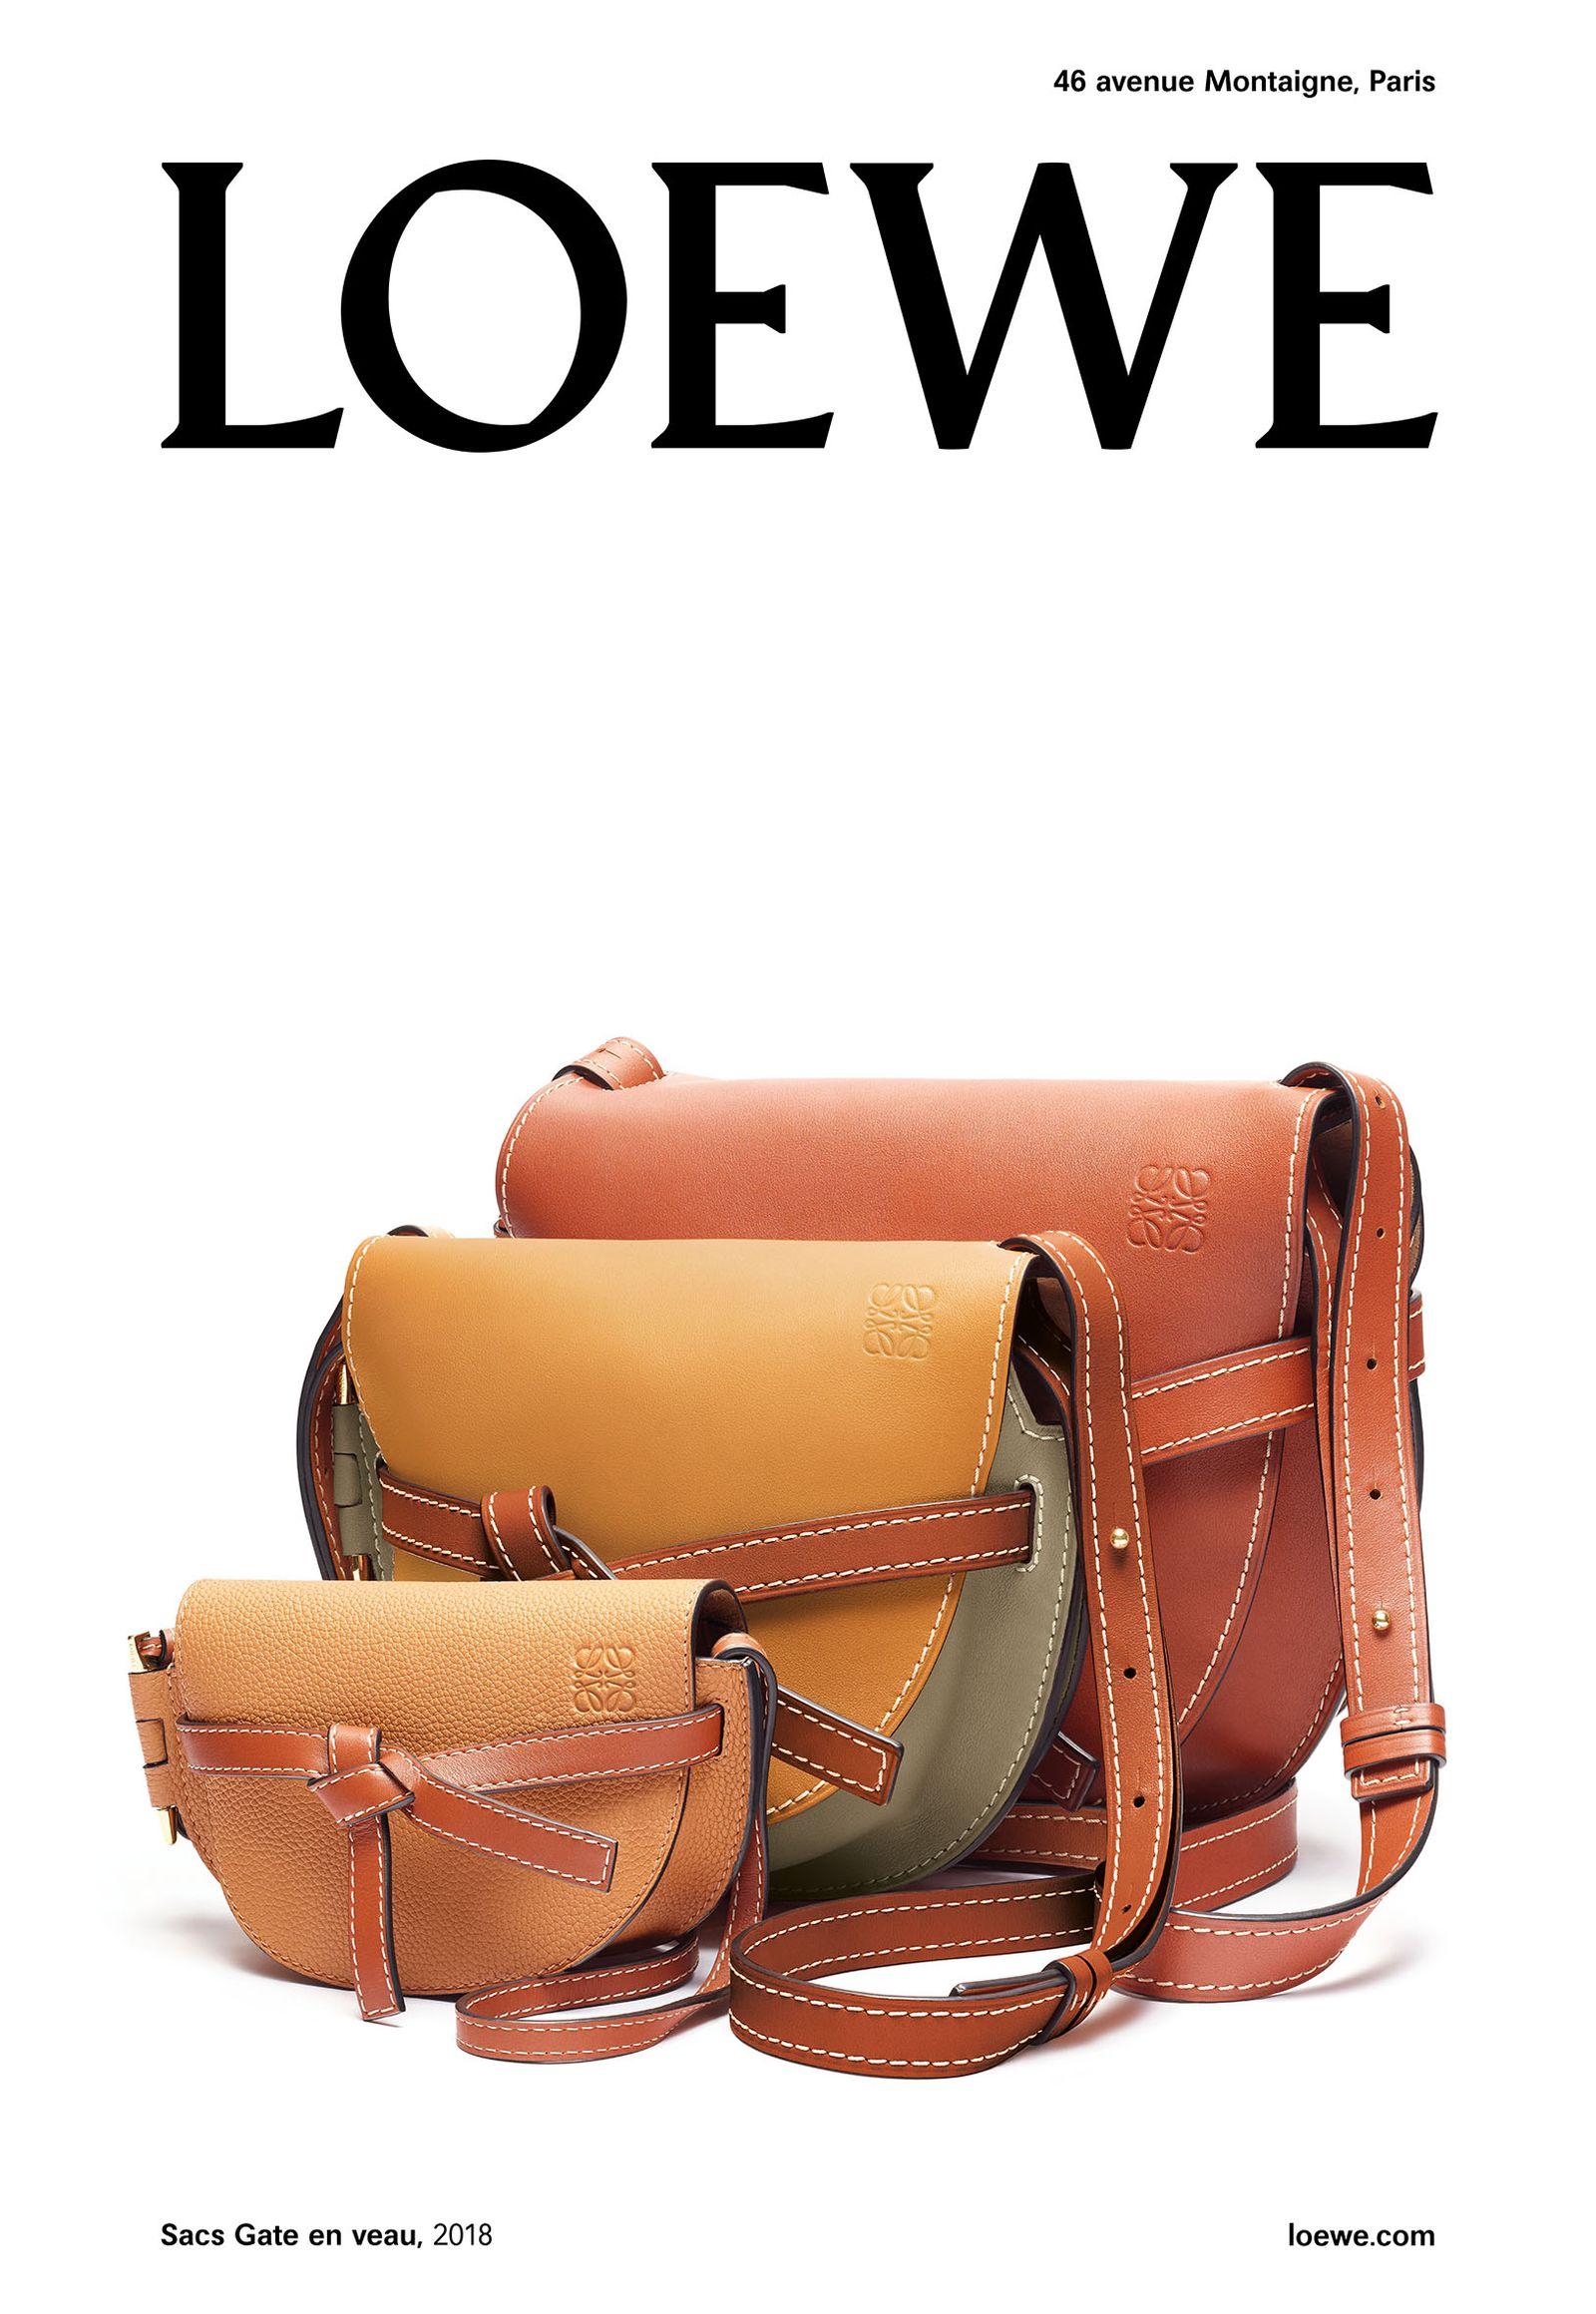 LOE 19 1 M KIOSK trazado2 Loewe jw anderson menswear